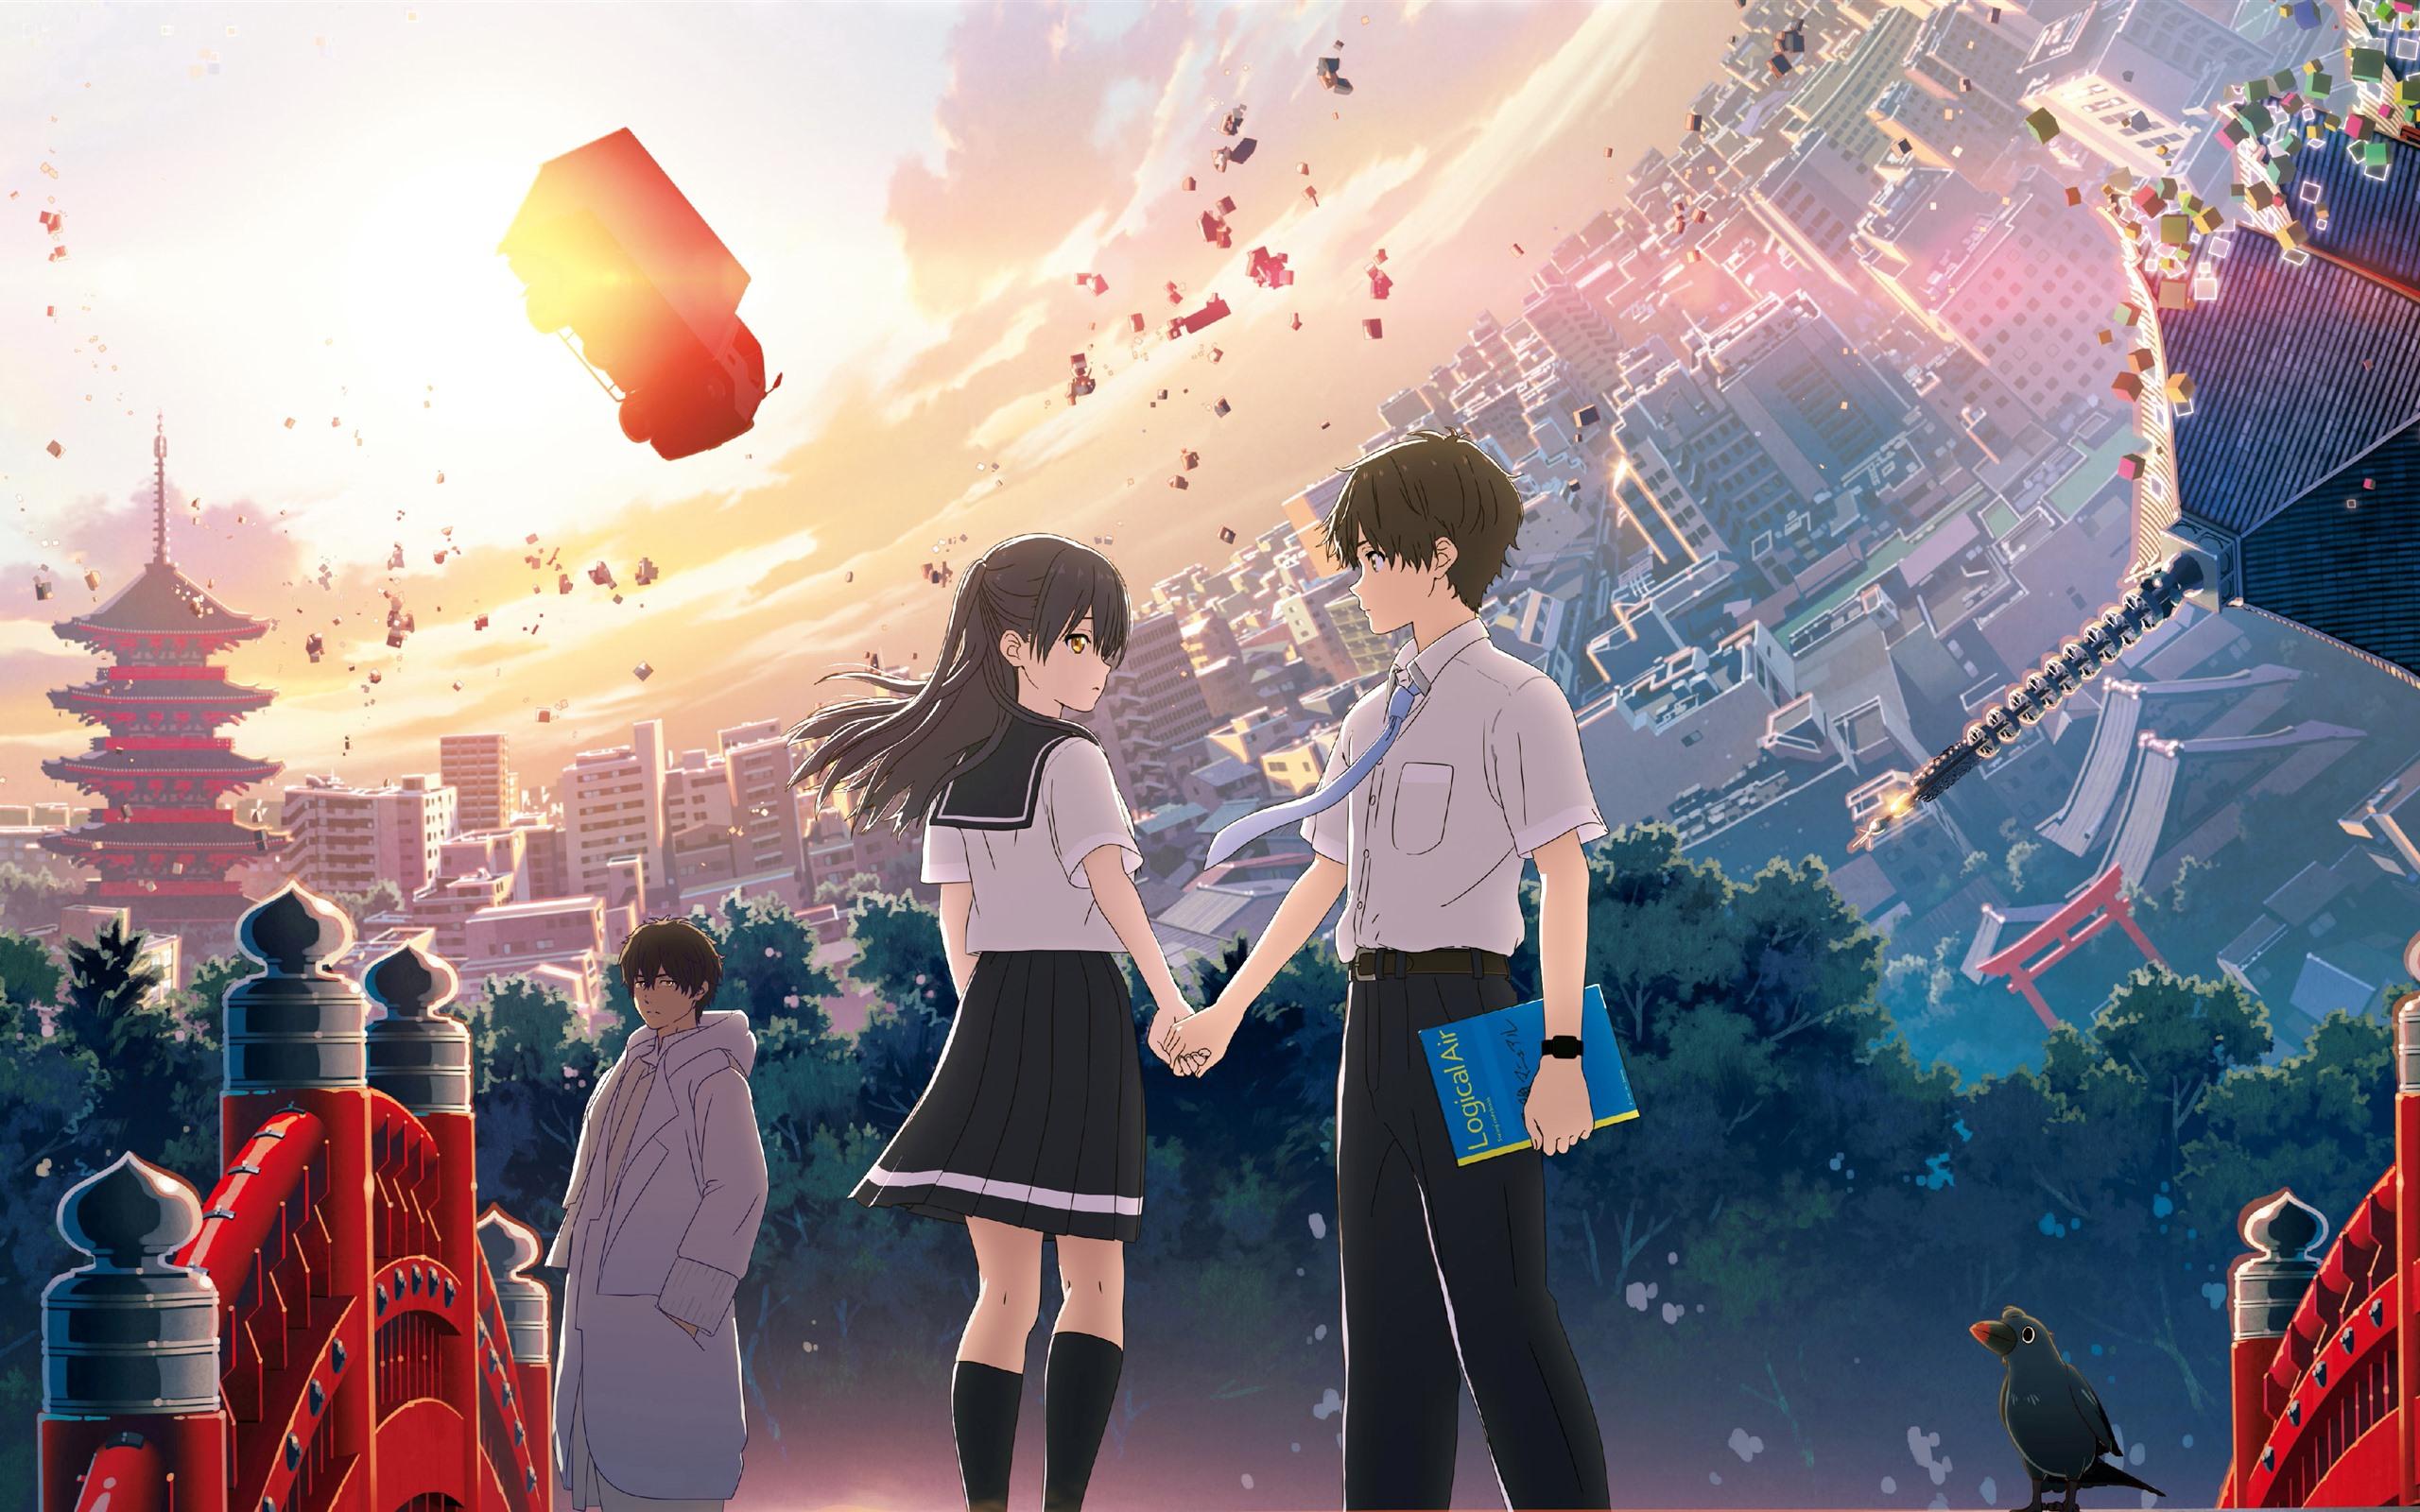 Wallpaper Hello World Anime Movie 2019 3840x2160 Uhd 4k Picture Image